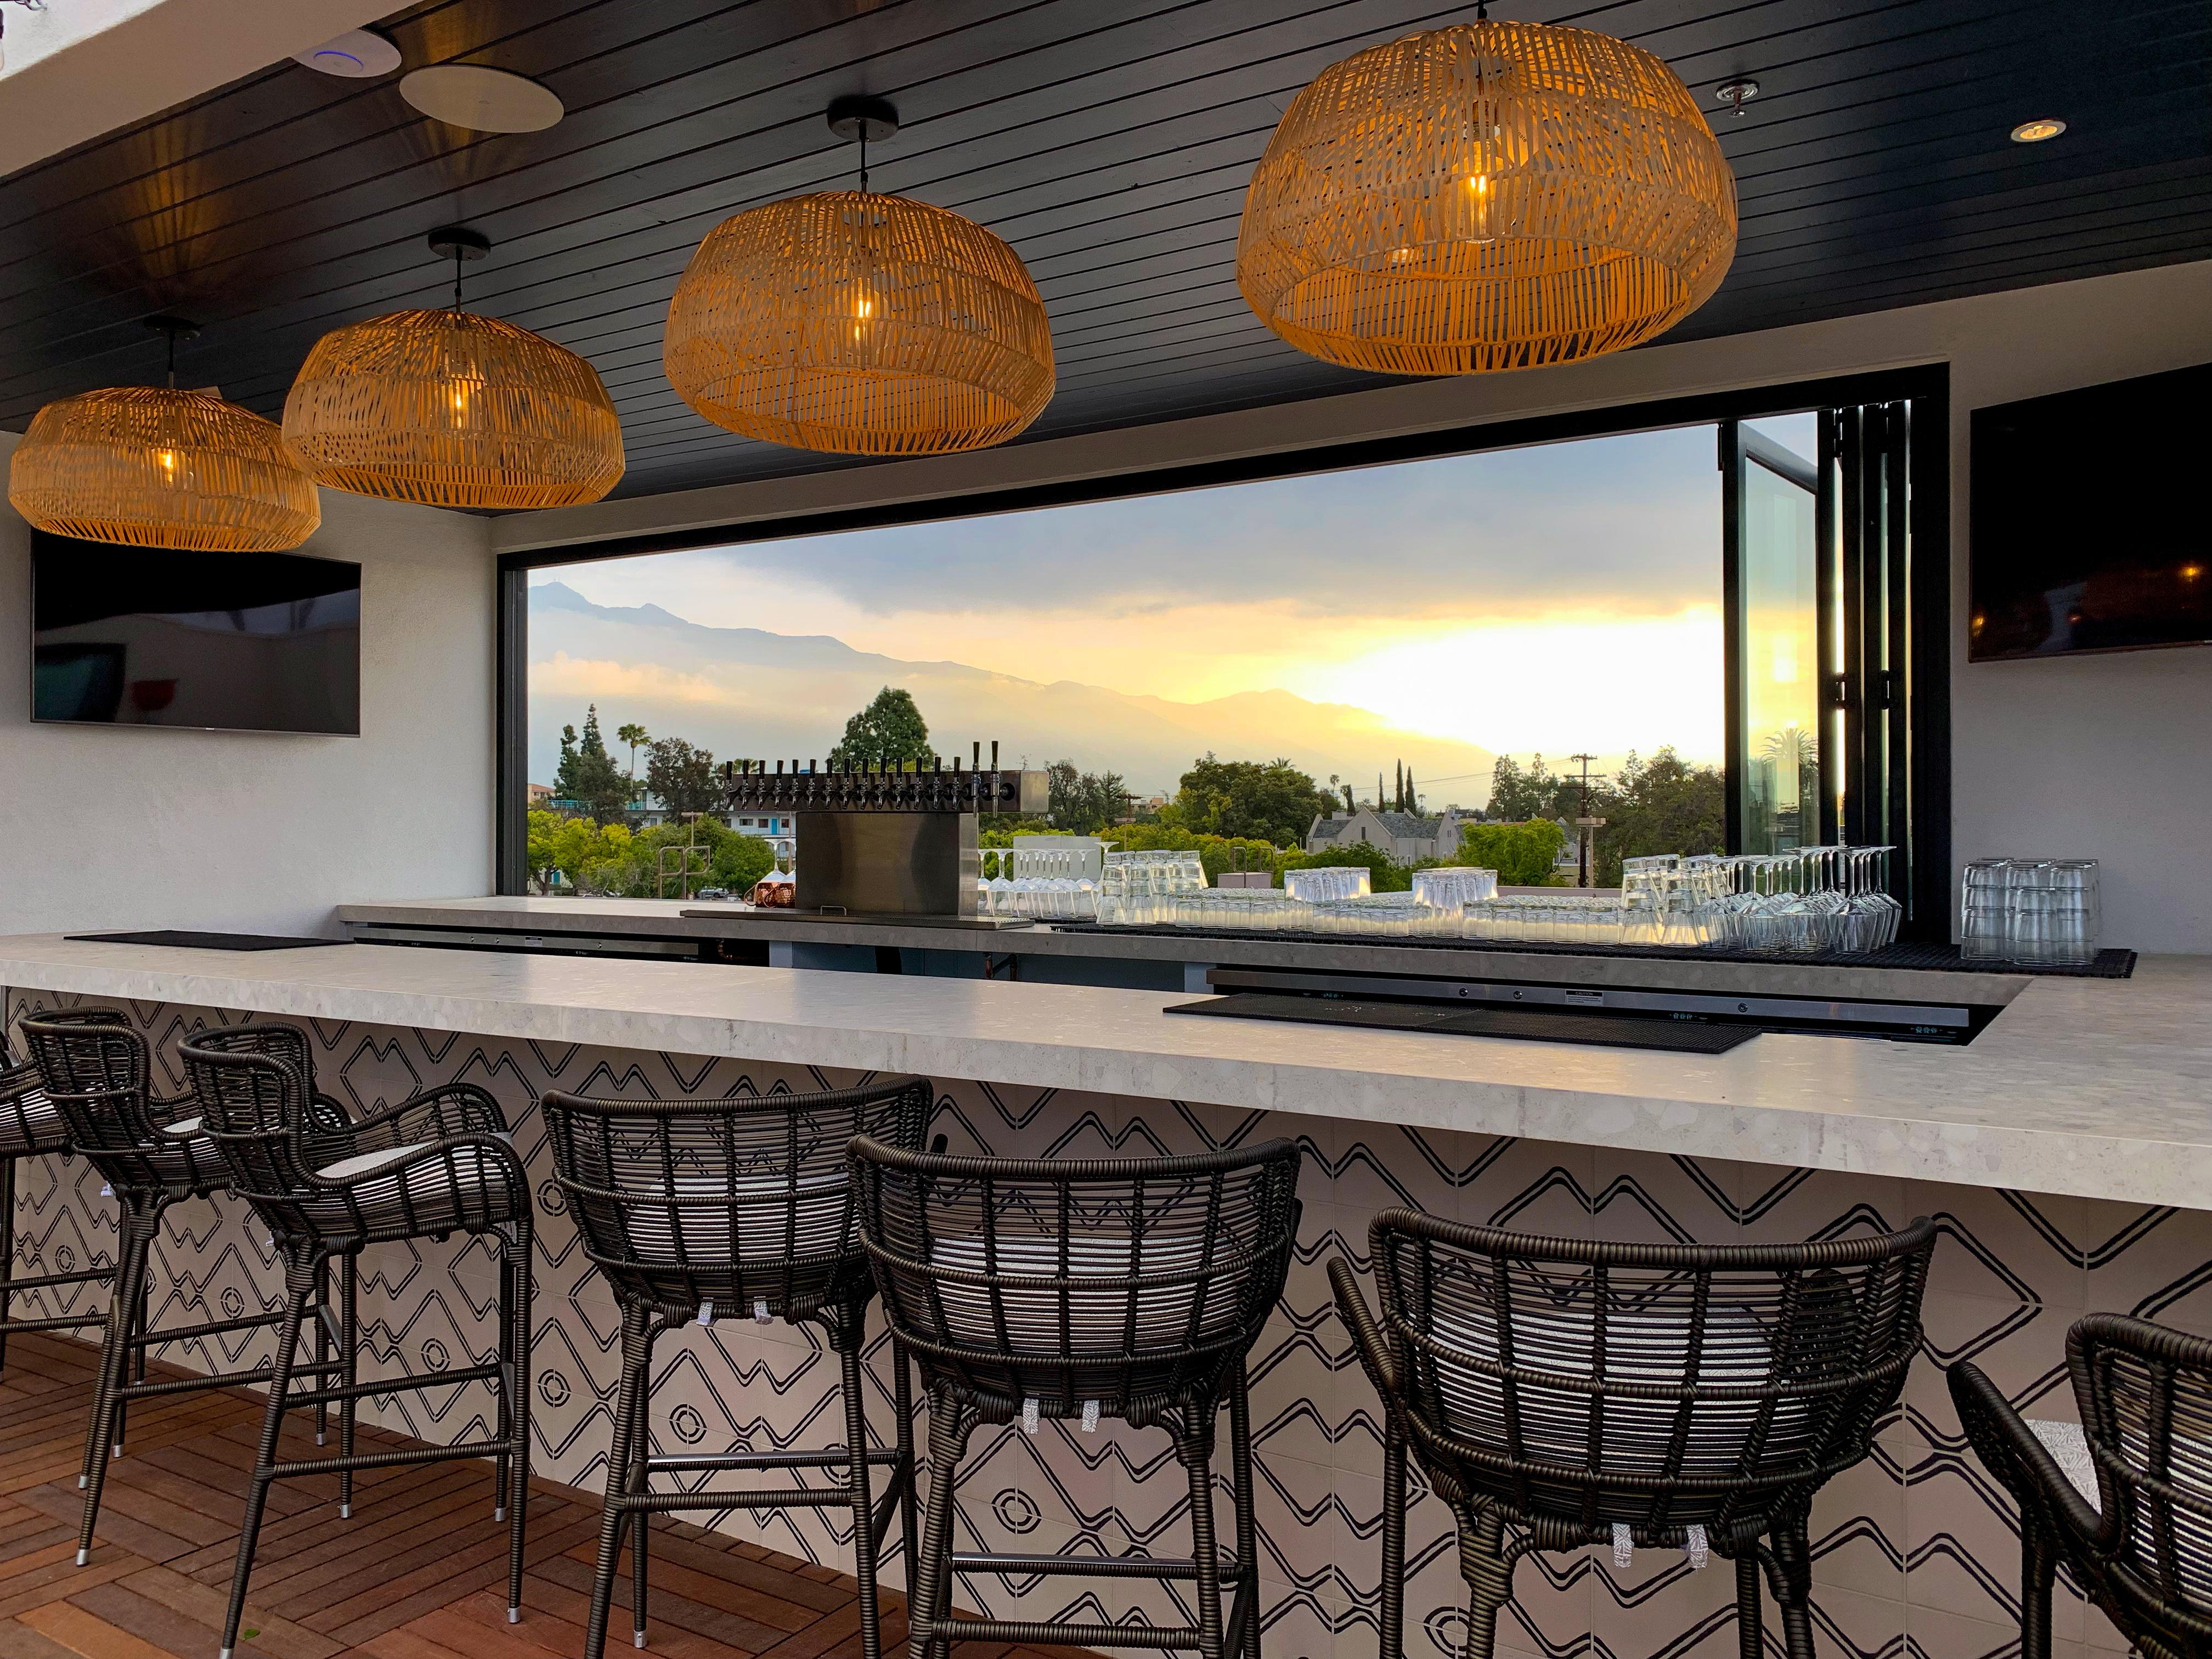 5 Best Outdoor Patio Bars in Pasadena for Summer on Best Backyard Bars  id=19568